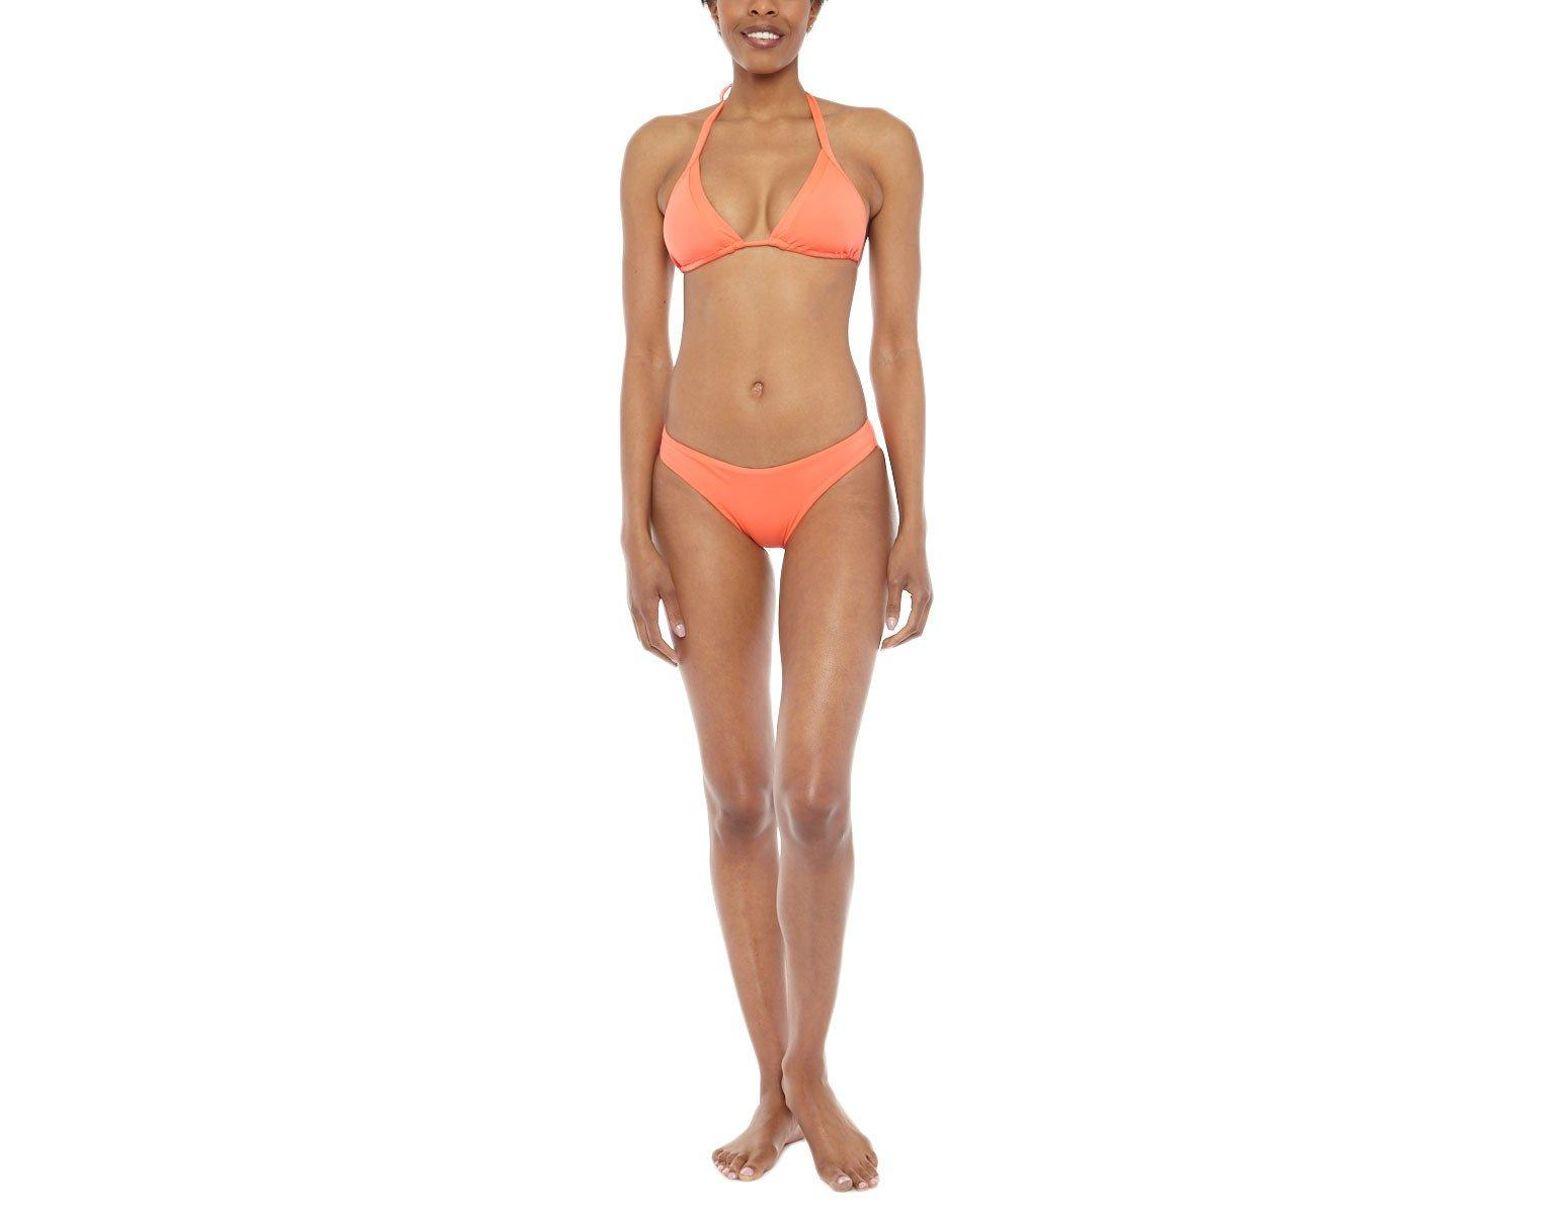 428b83a3c3dcf Seafolly Goddess Slide Halter Ties Triangle Bikini Top - Nectarine in  Orange - Lyst